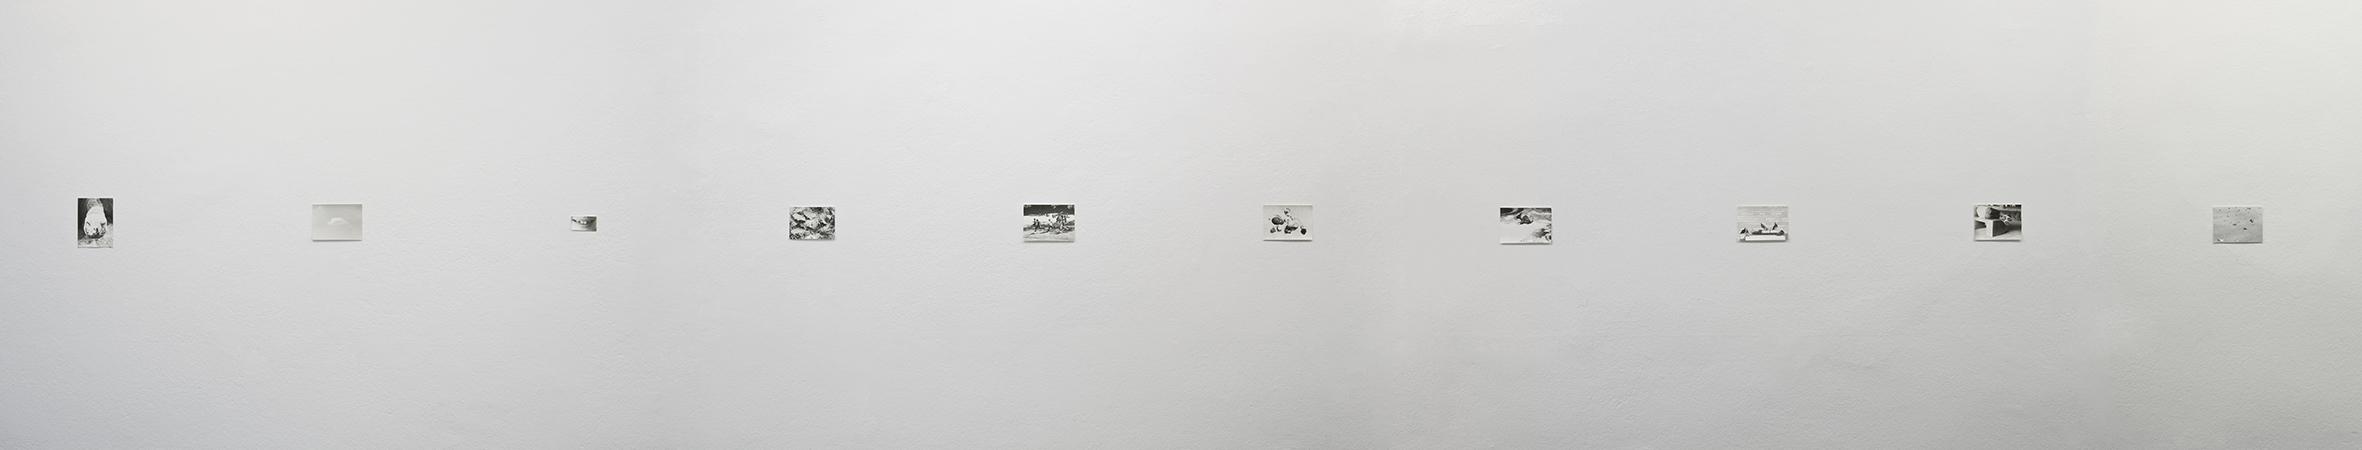 Lyren, 2013 | Jochen Lempert | ProjecteSD